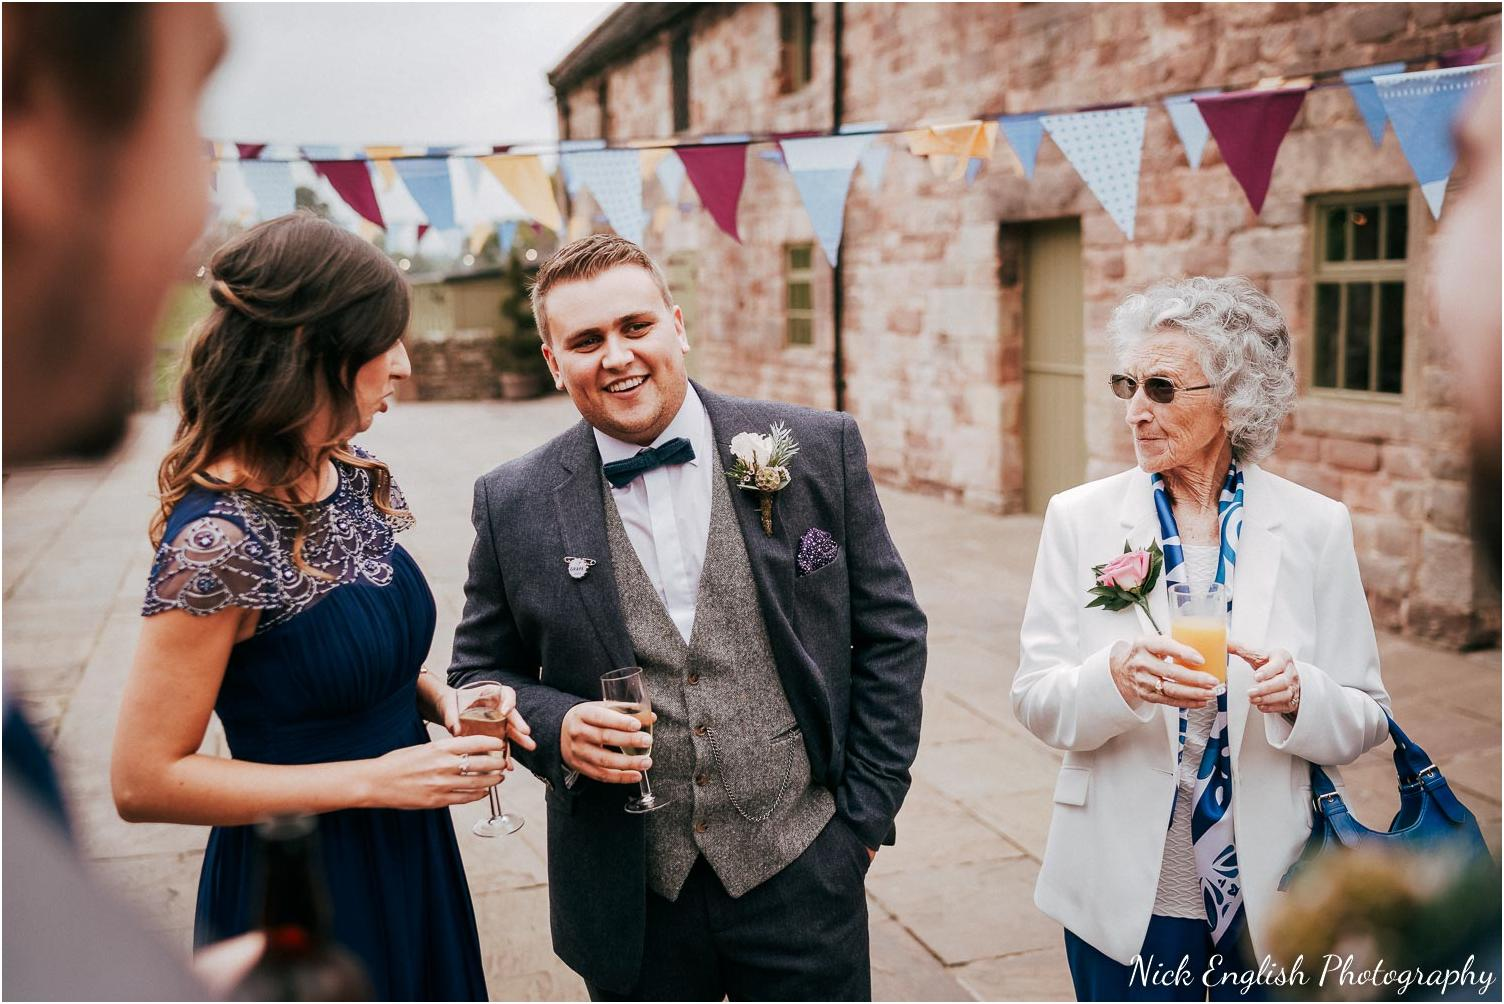 The_Ashes_Barn_Endon_Stoke_Wedding_Photographer-52.jpg